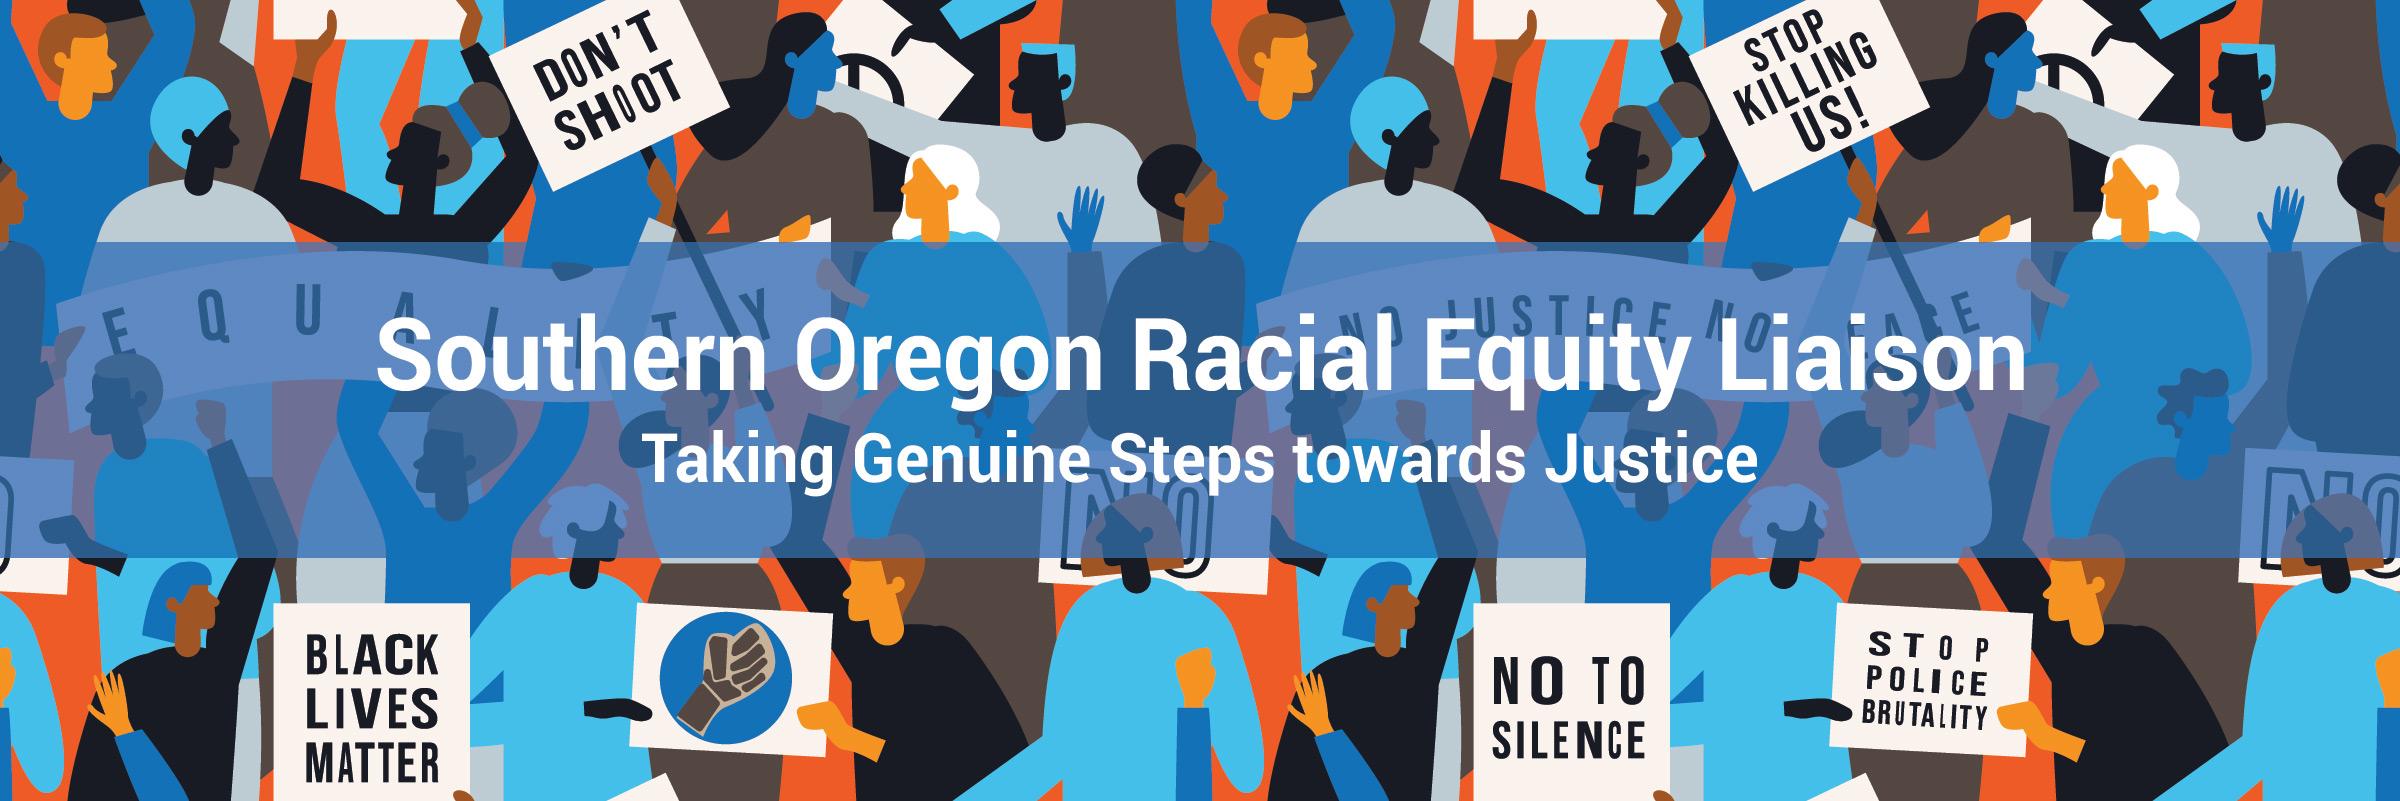 Southern Oregon Racial Equity Liaison